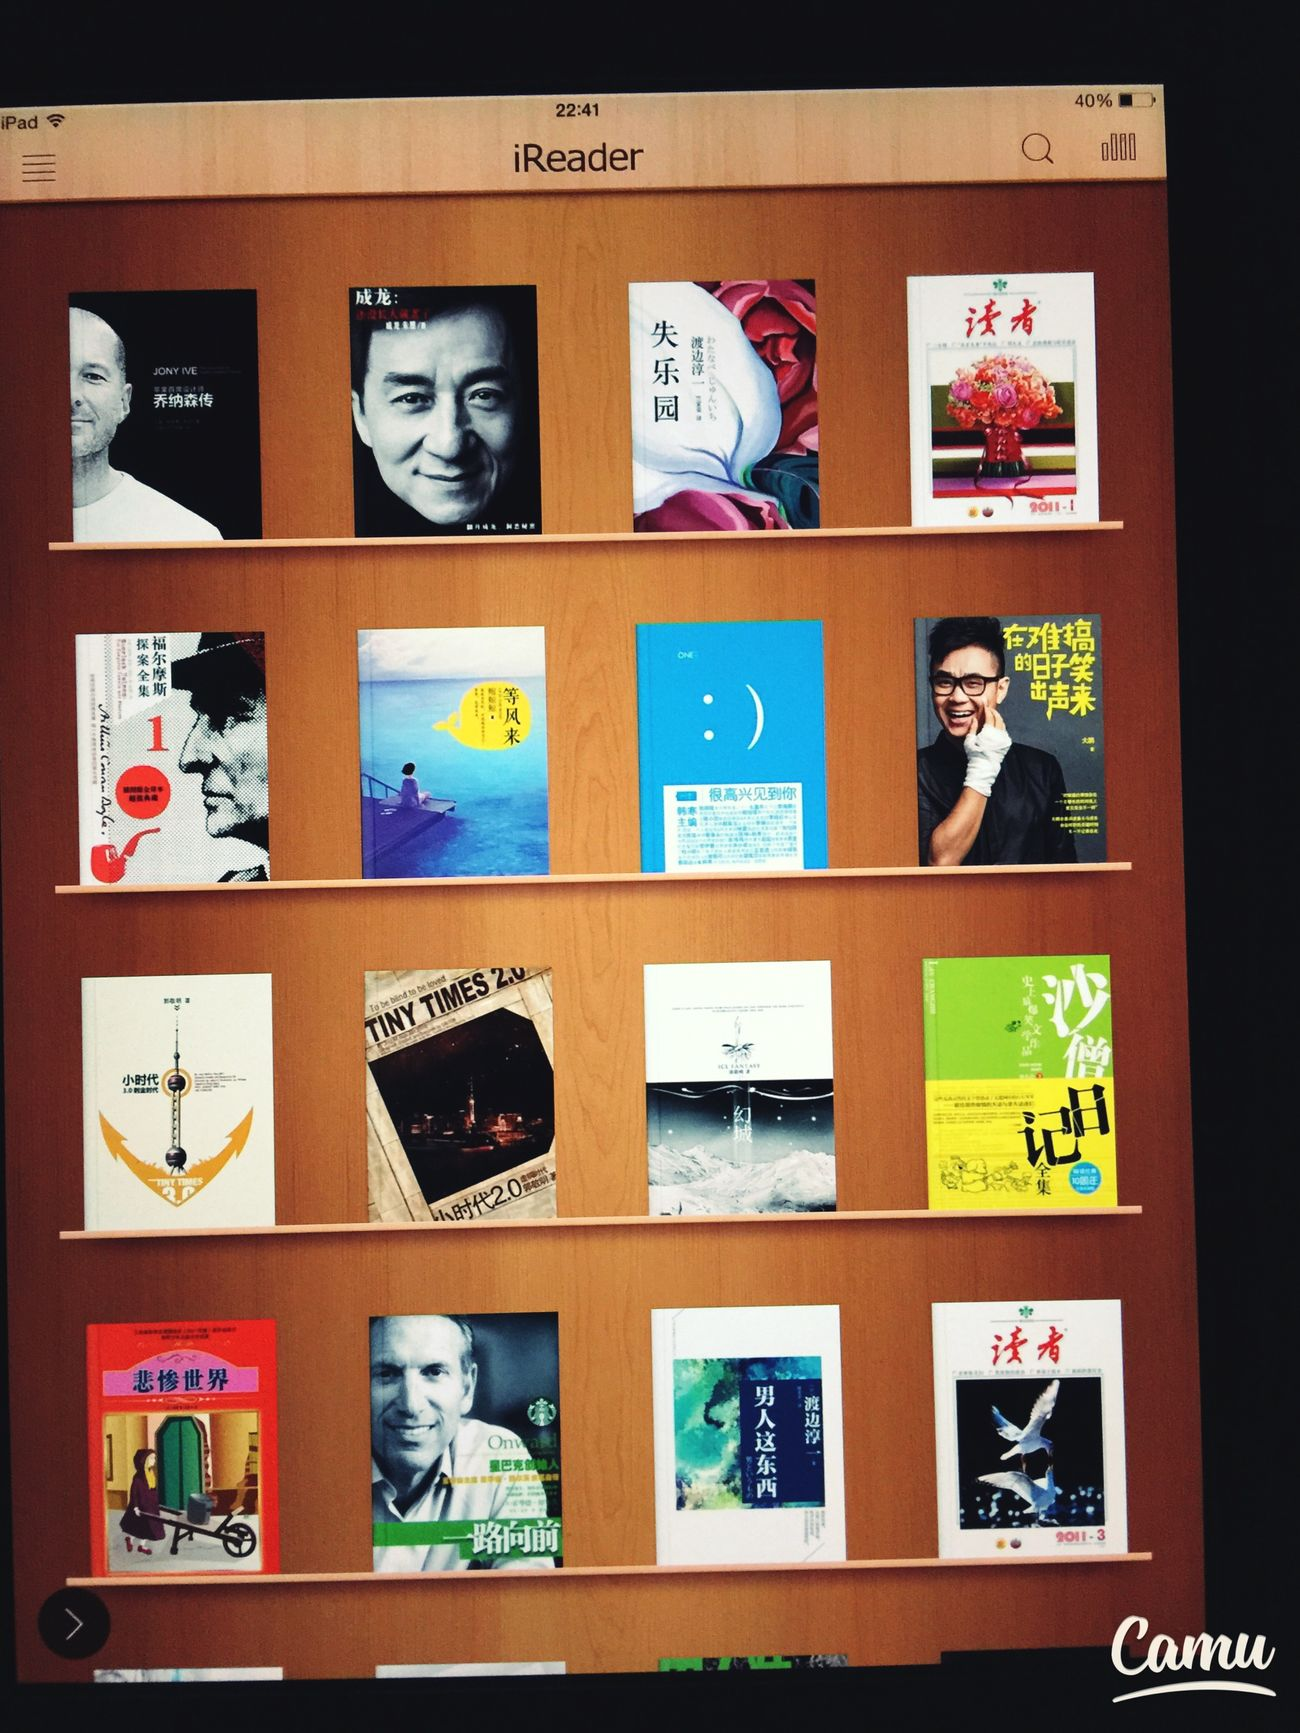 IPhone IReader 我看书的习惯大概就是两年前知道她是个很爱看书的女孩 于是为了更好的制造共同话题 我也渐渐养成看书的习惯 起初并不知道有什么好看 只不过偶然见到她微博发相 她看什么我就看什么书 没有想到 渐渐的 看书的习惯就养成了 现在iReader上的书 书店淘回来的 亚马逊上推荐的 我都有买 都有试读 这也许就是无心插柳柳成荫吧